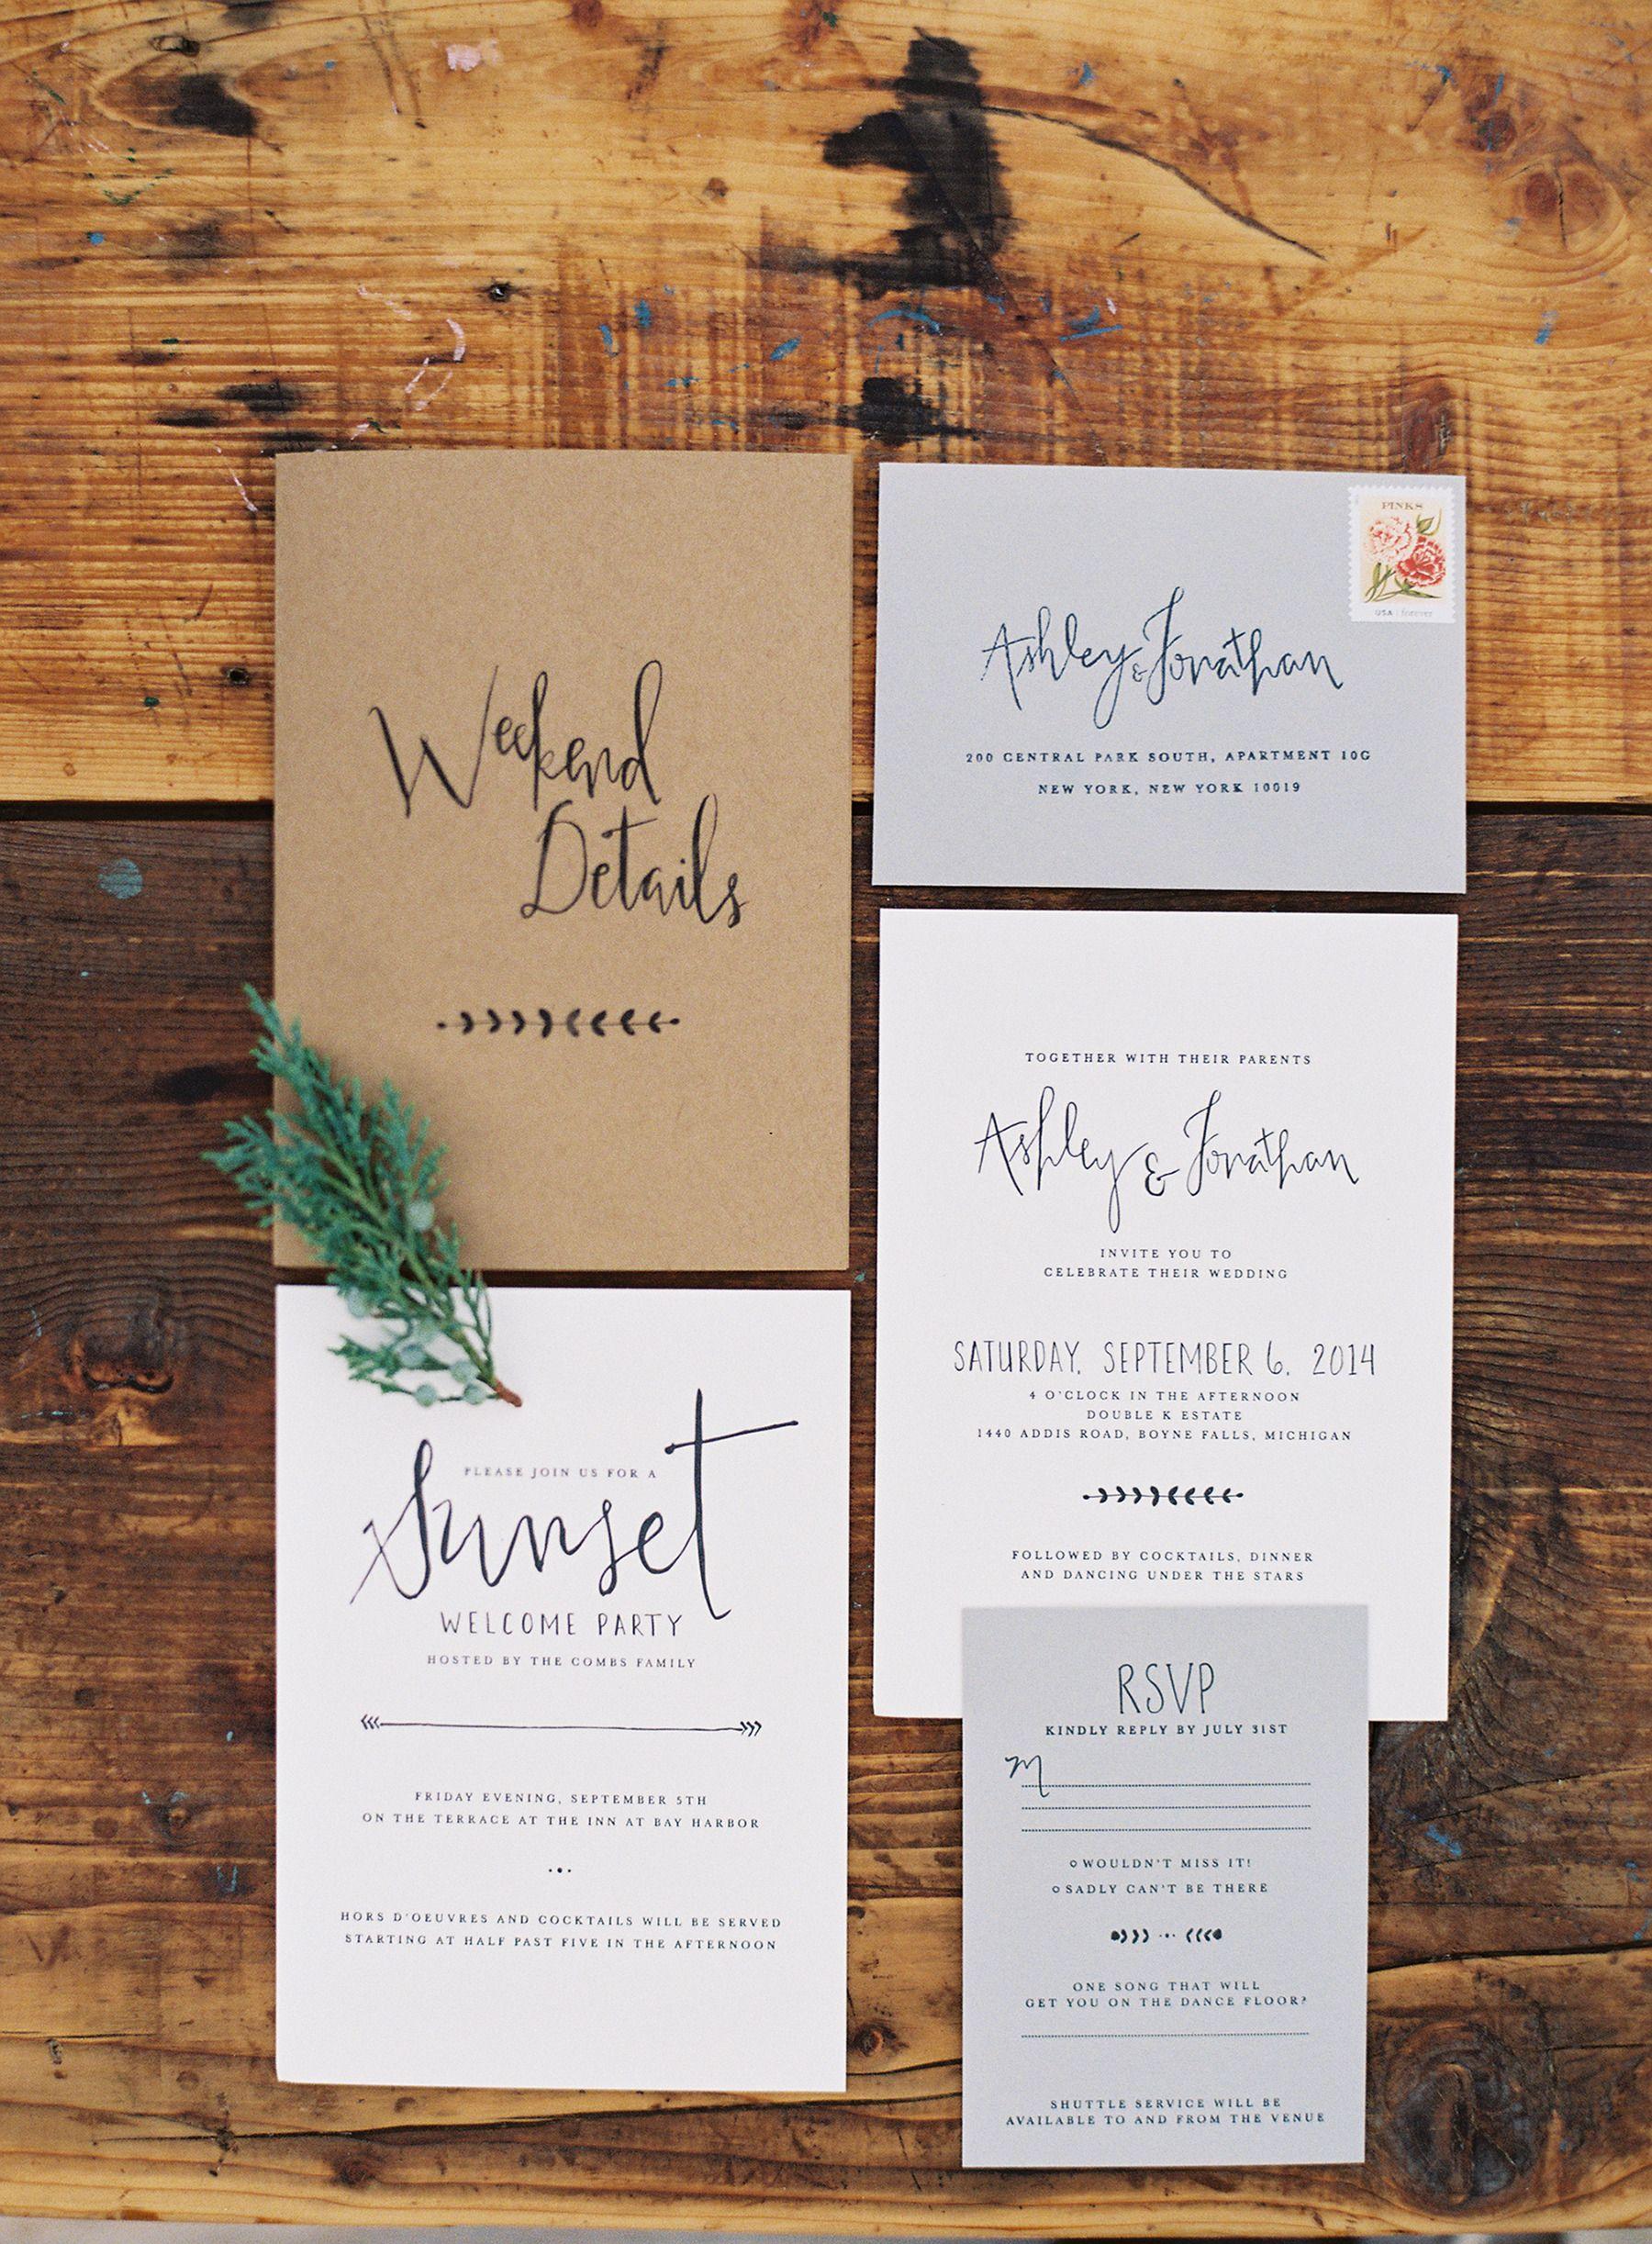 Rustic Chic Estate Wedding in Northern Michigan – Modern Rustic Wedding Invitations